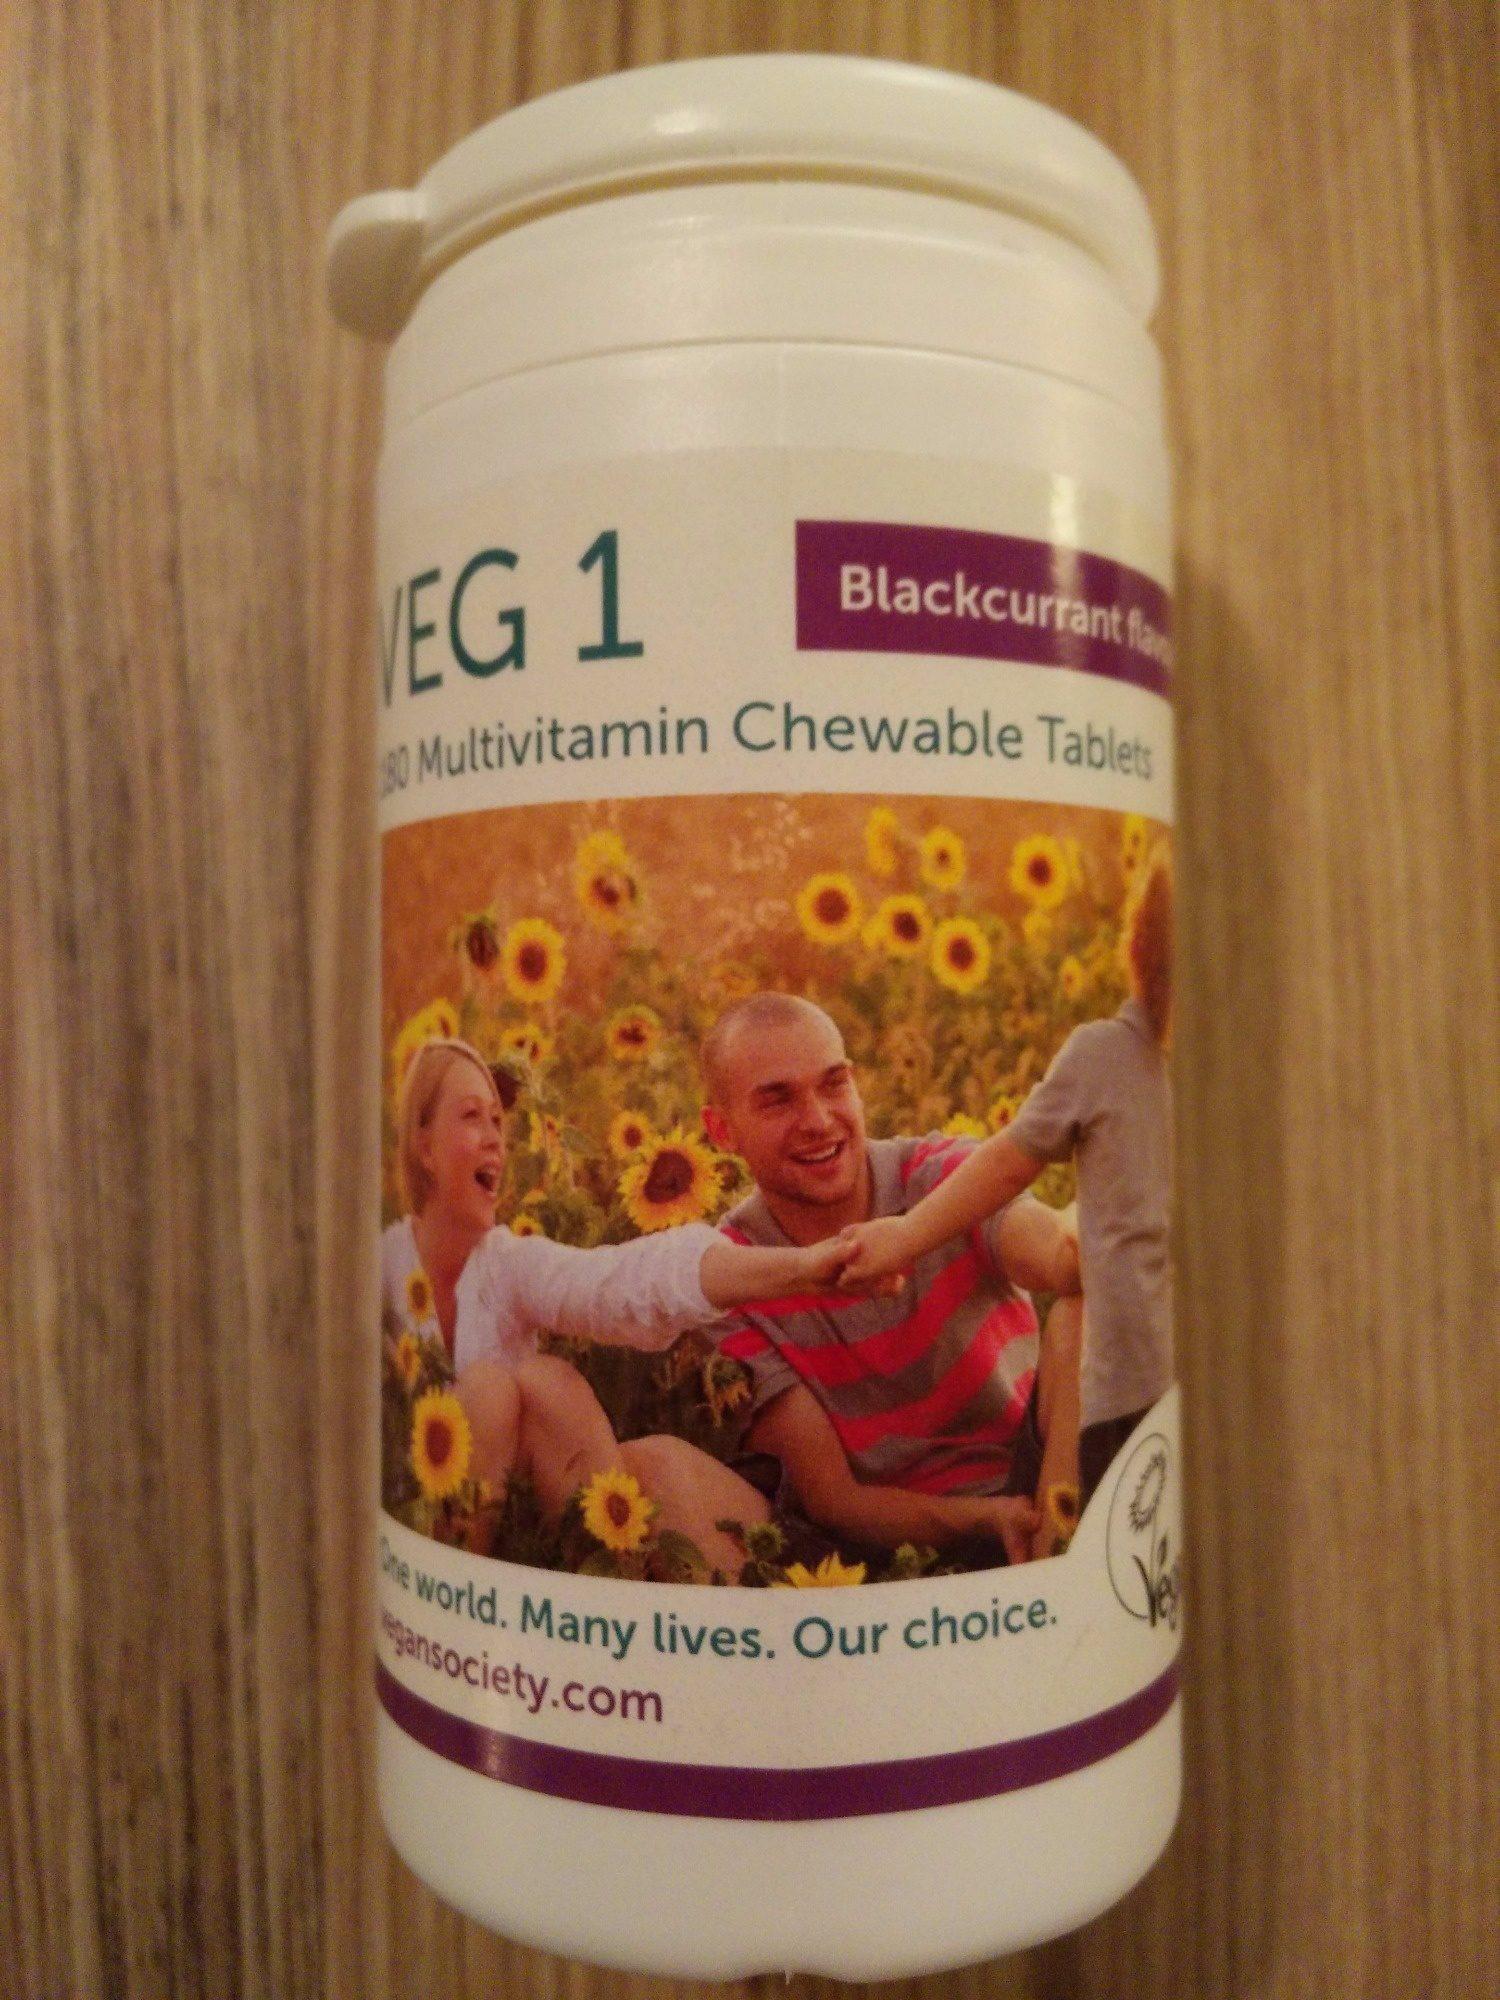 VEG 1 Multivitamin Chewable Tablets - Product - en